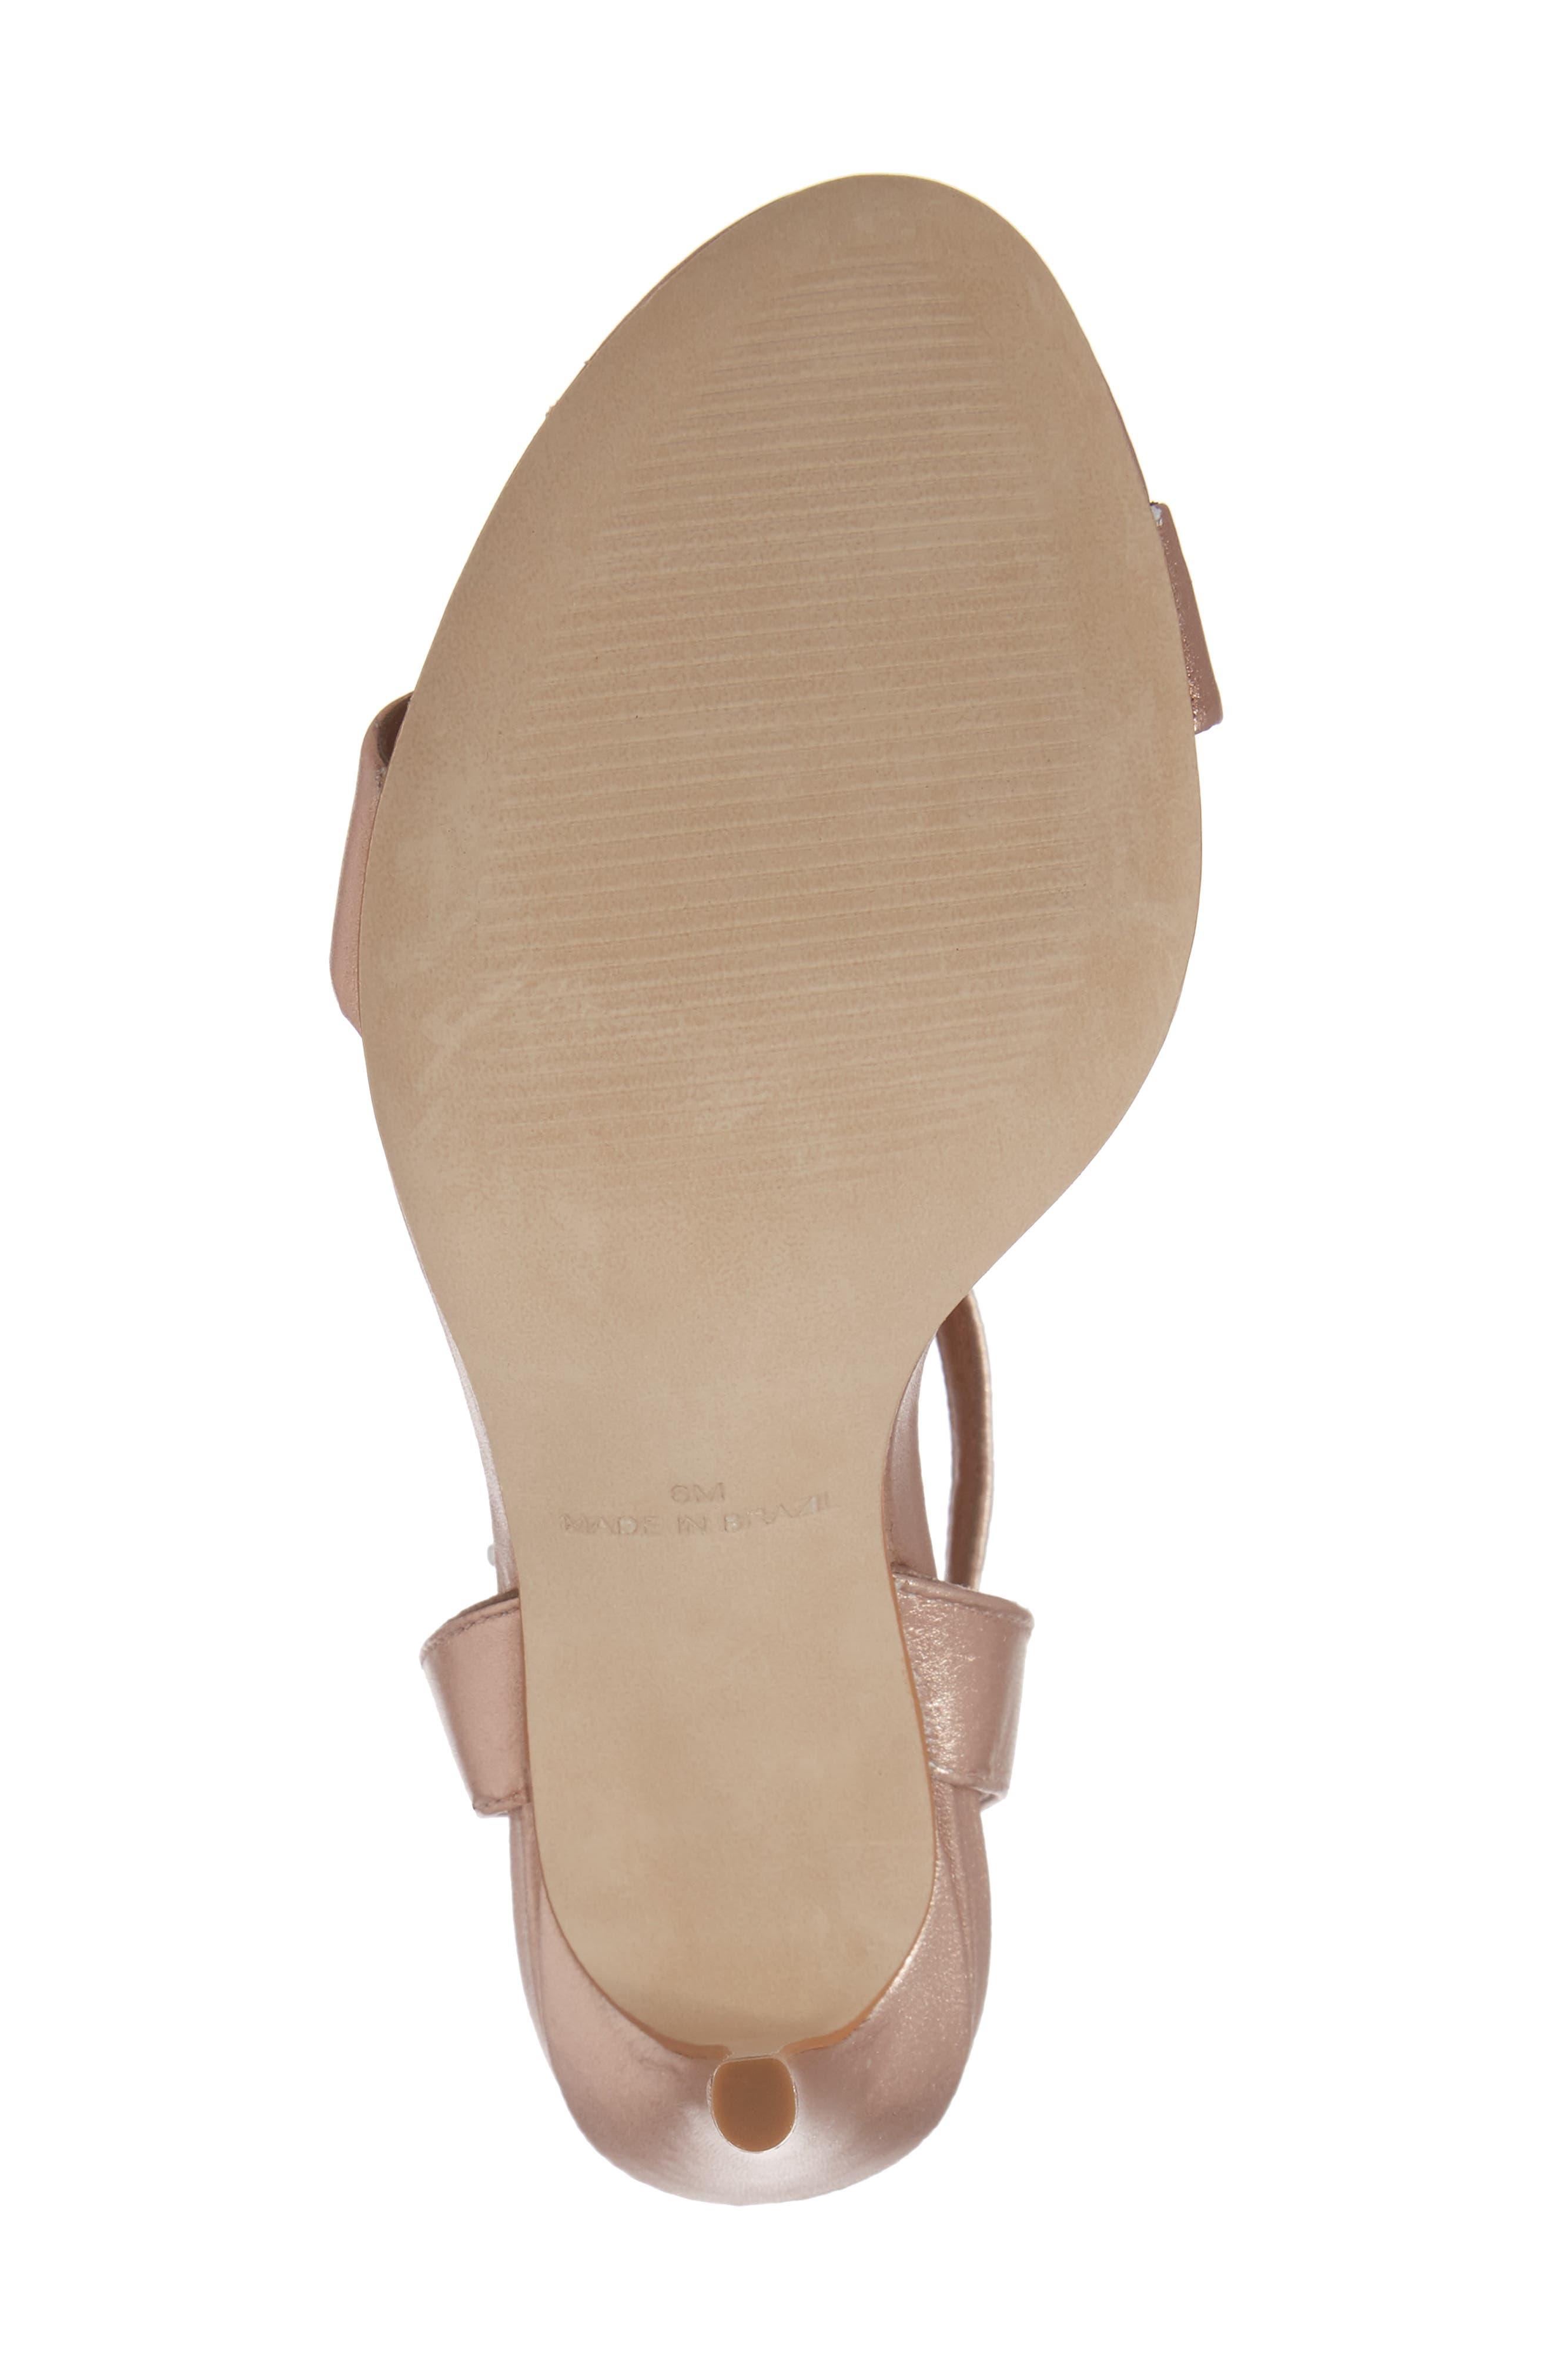 Landen Ankle Strap Sandal,                             Alternate thumbnail 98, color,